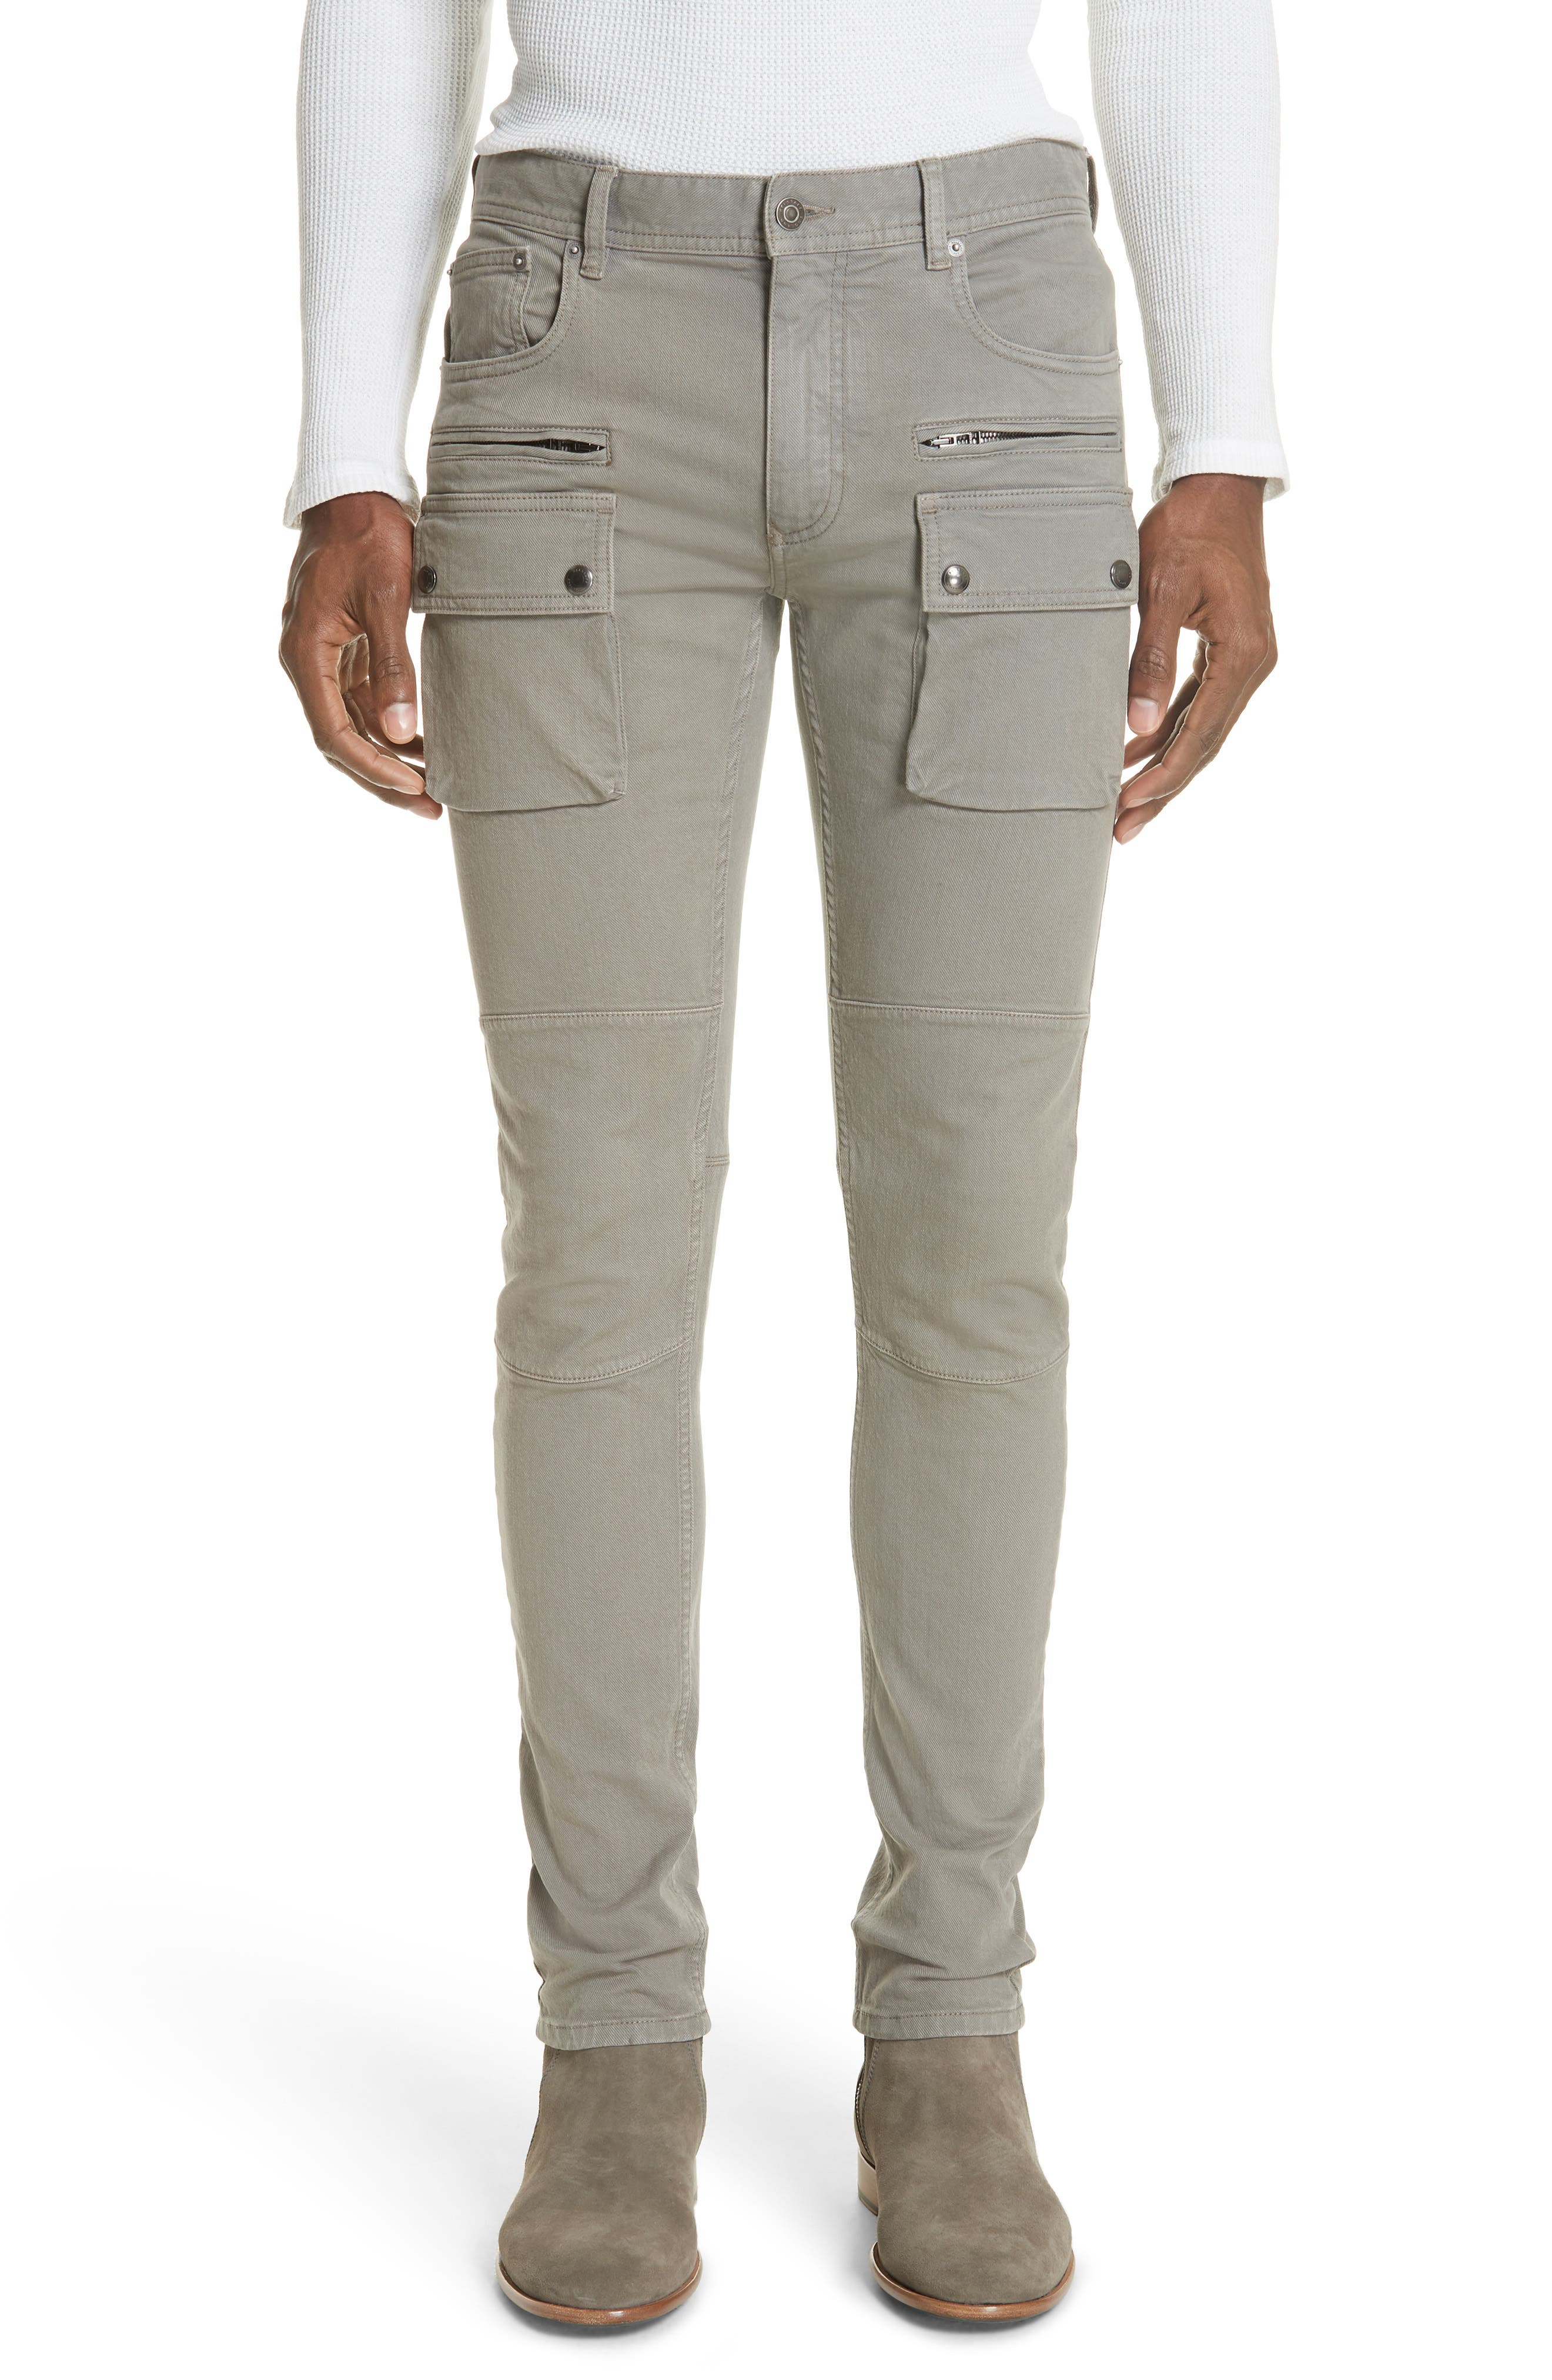 Polmont Cargo Denim Jeans,                         Main,                         color, SMOKE GREY